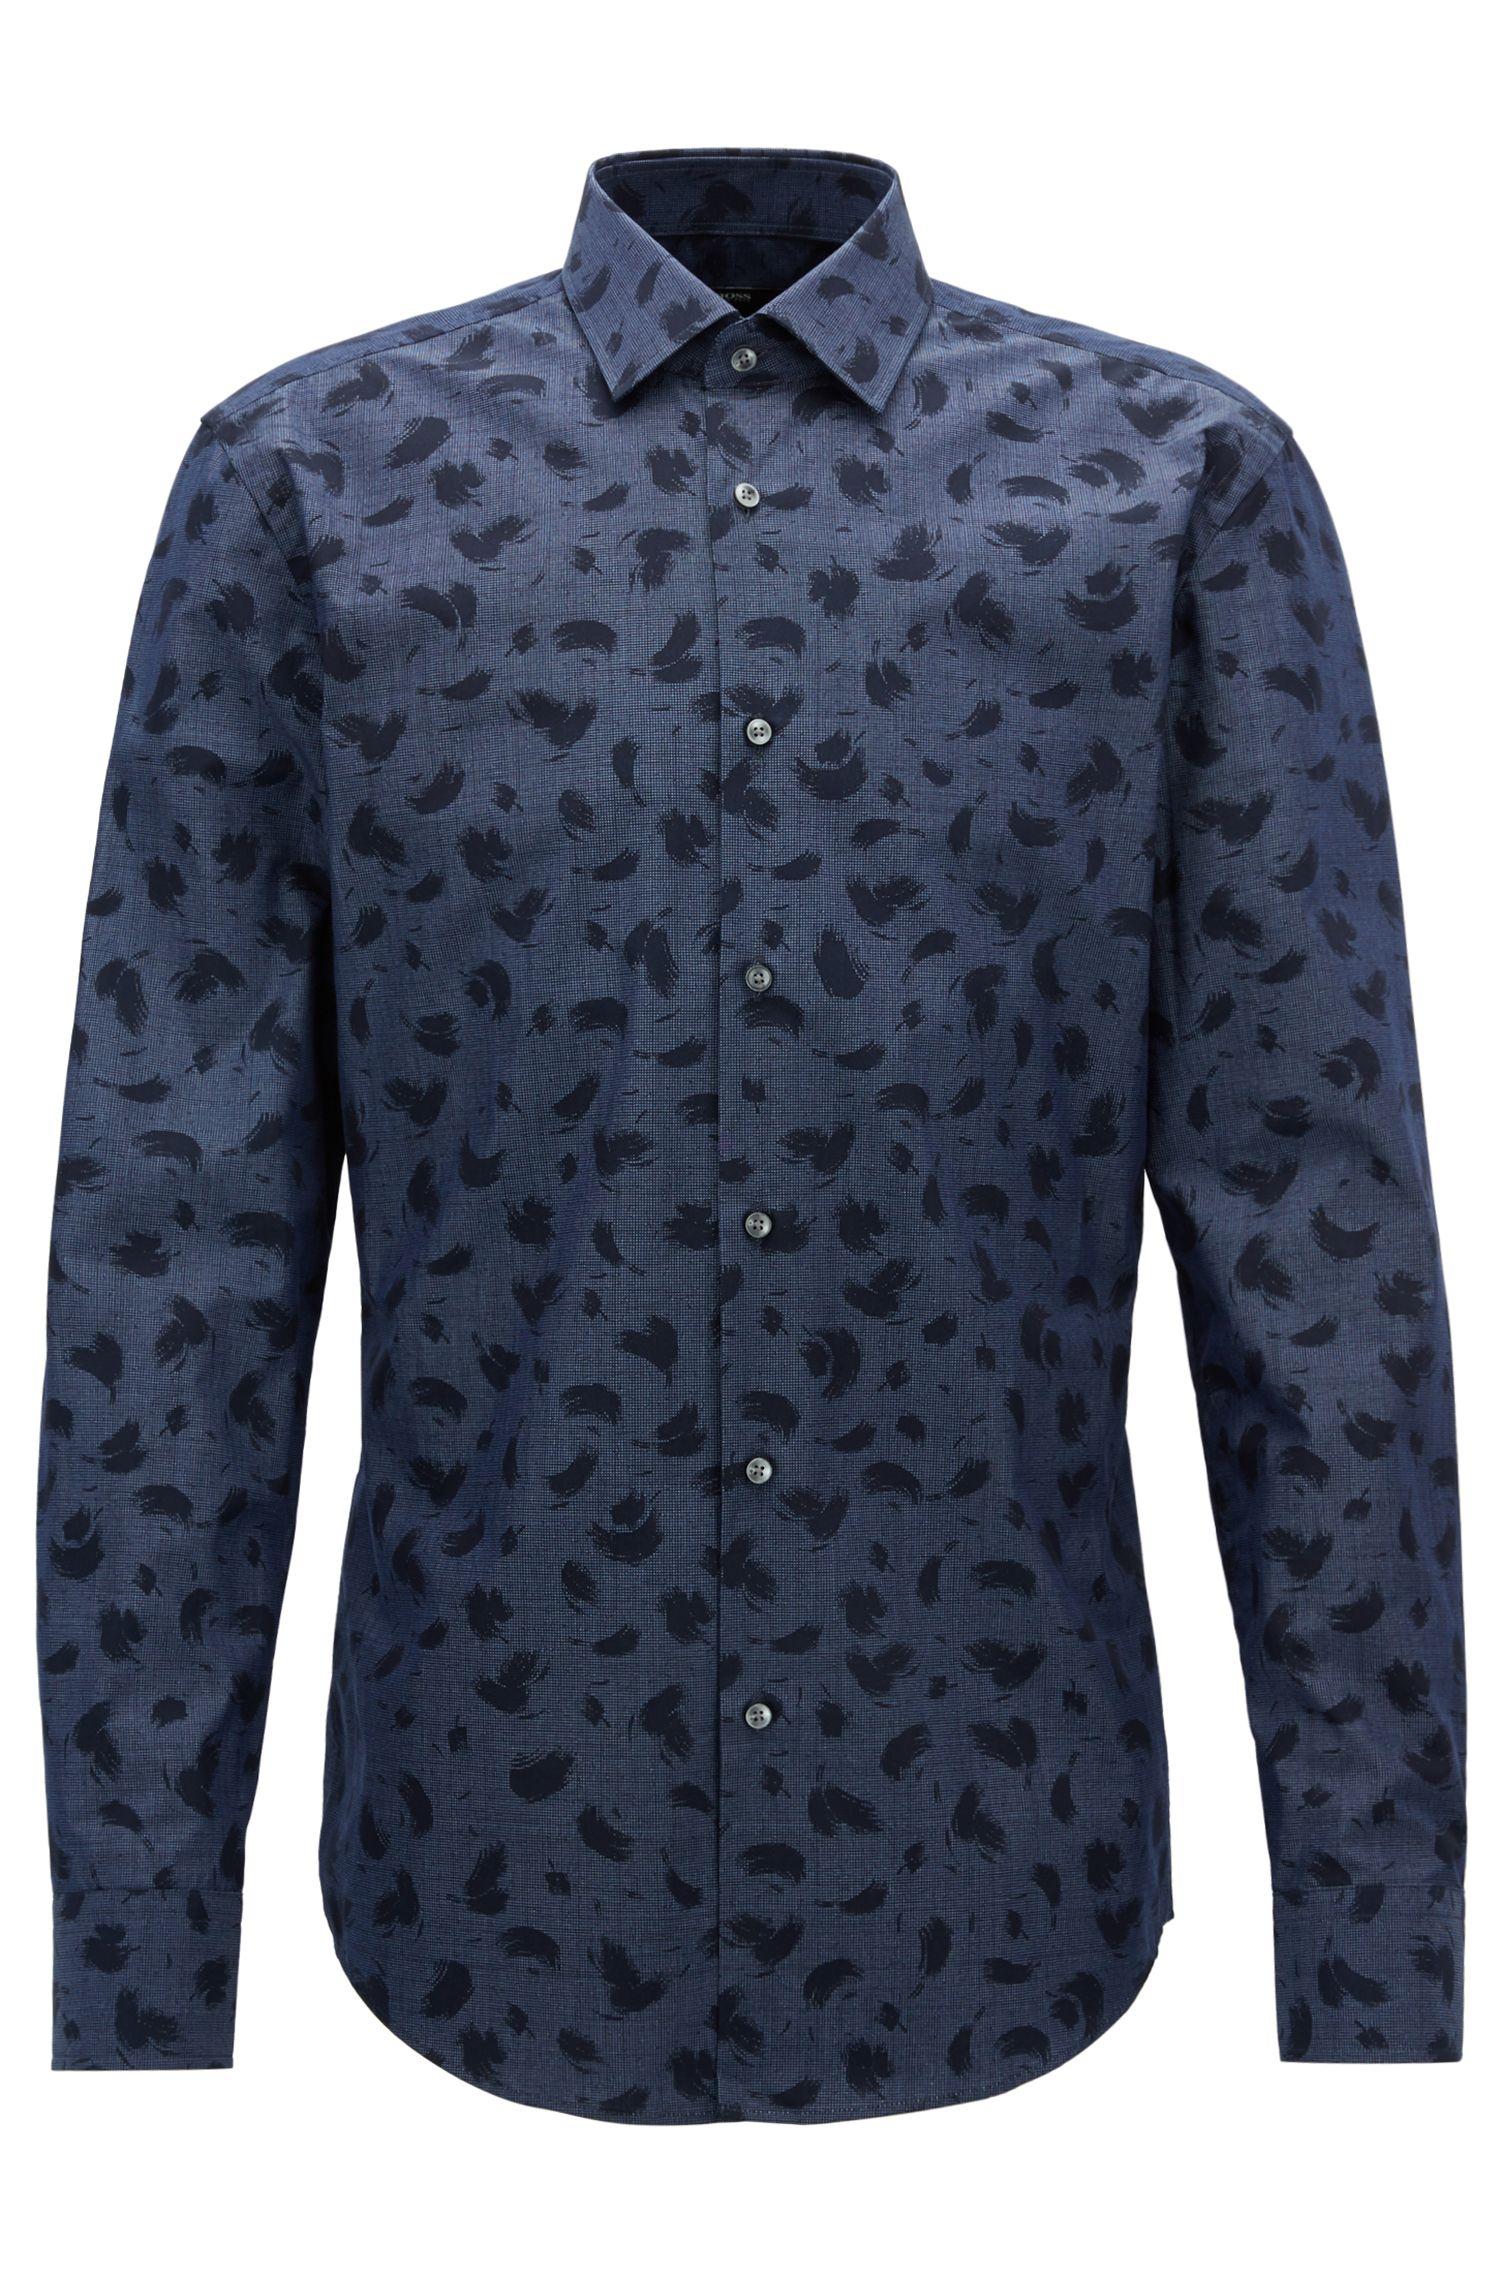 Brush-Print Cotton Dress Shirt, Slim Fit | Jenno, Dark Blue